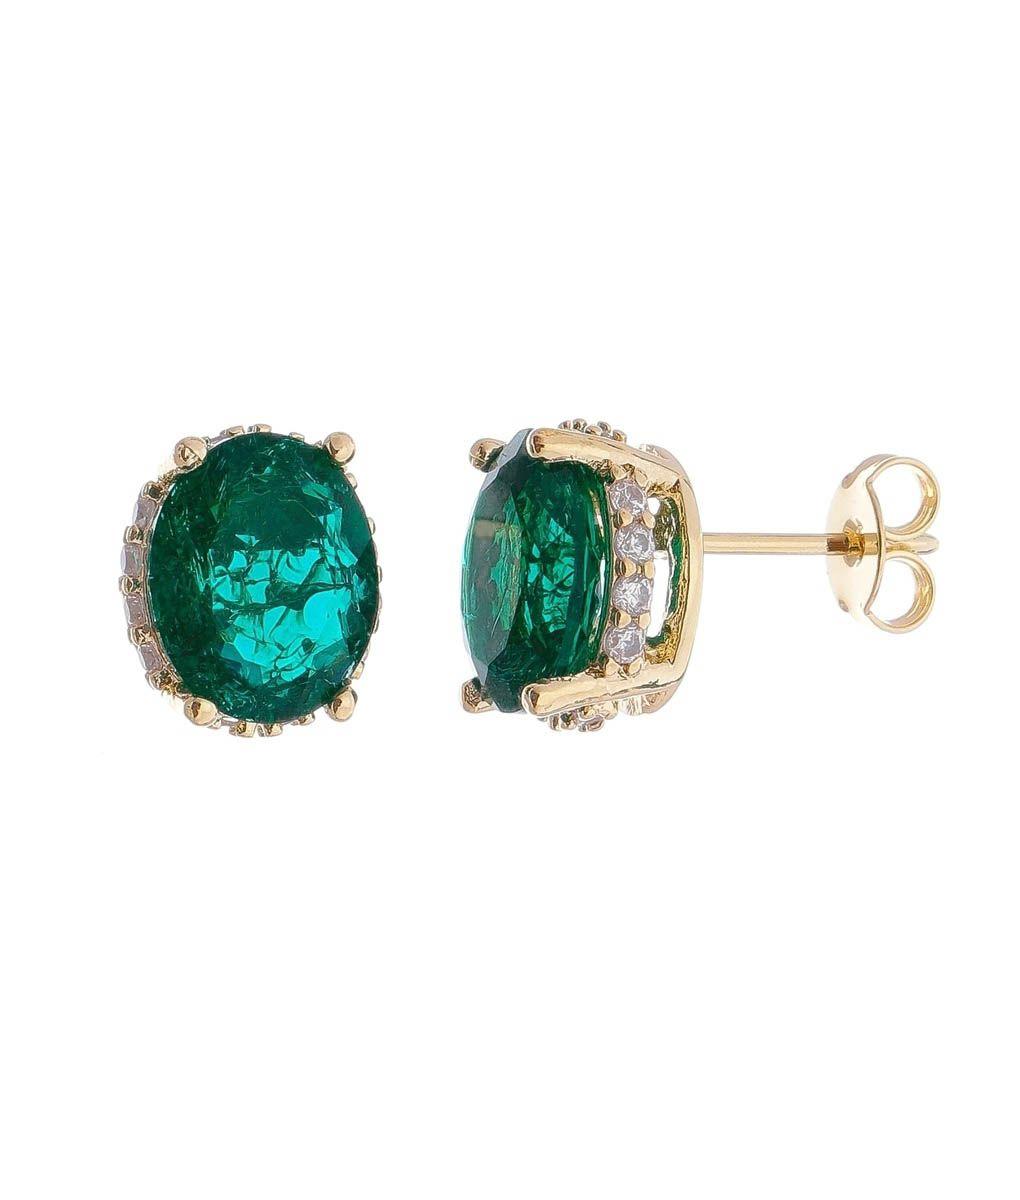 Compre Brinco esmeralda fusion oval com galeria cravejada de zirconias  banho de ouro na Waufen ✓ 9c67cc015f